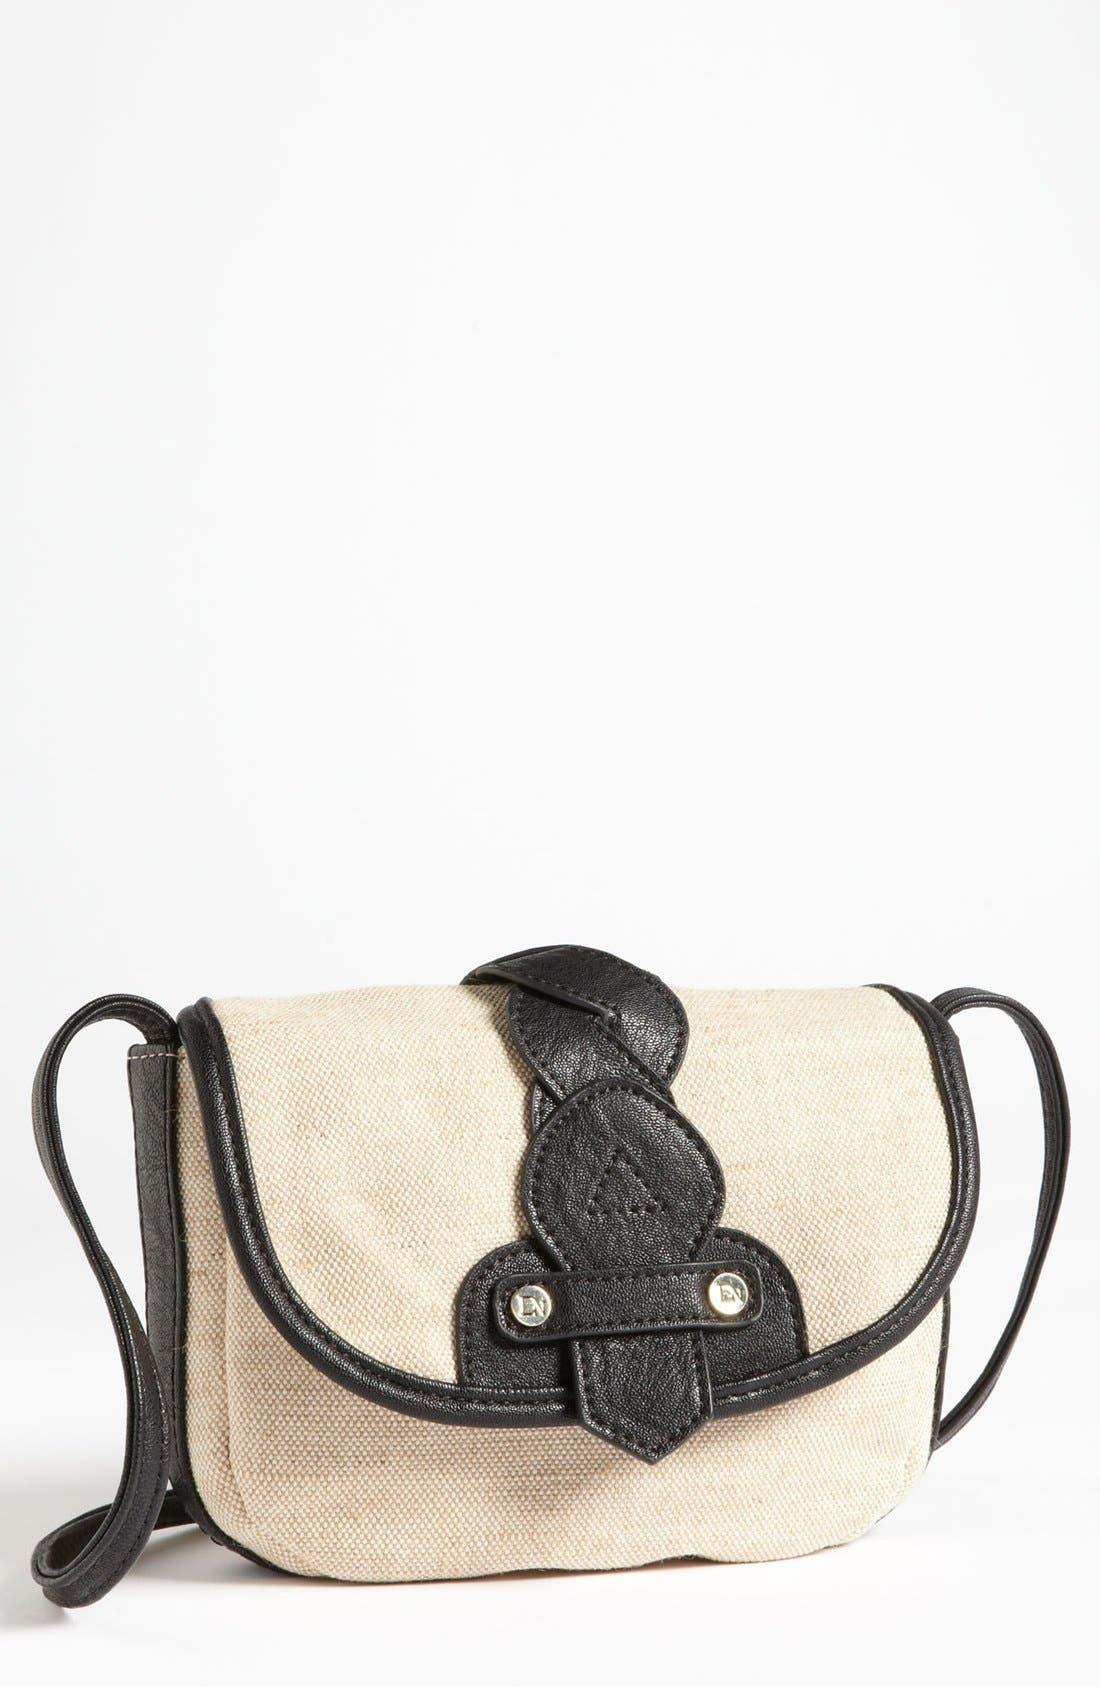 Alternate Image 1 Selected - Danielle Nicole 'Nola' Canvas Crossbody Bag